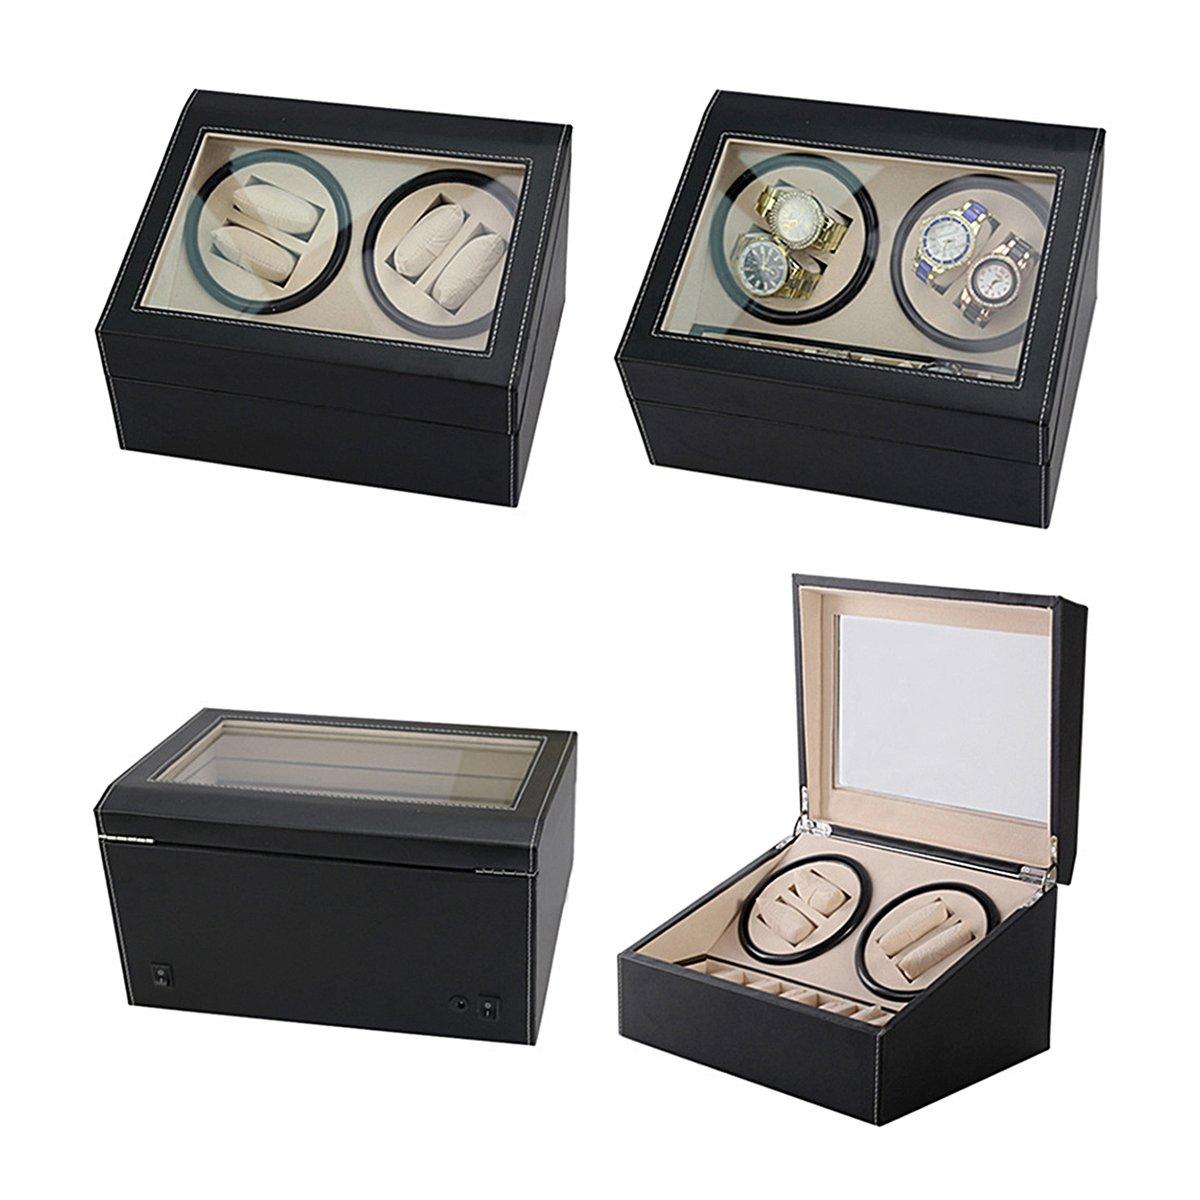 HooAMI Leather Automatic Rotation 4+6 Watch Winder Storage Case Display Box by HooAMI (Image #4)